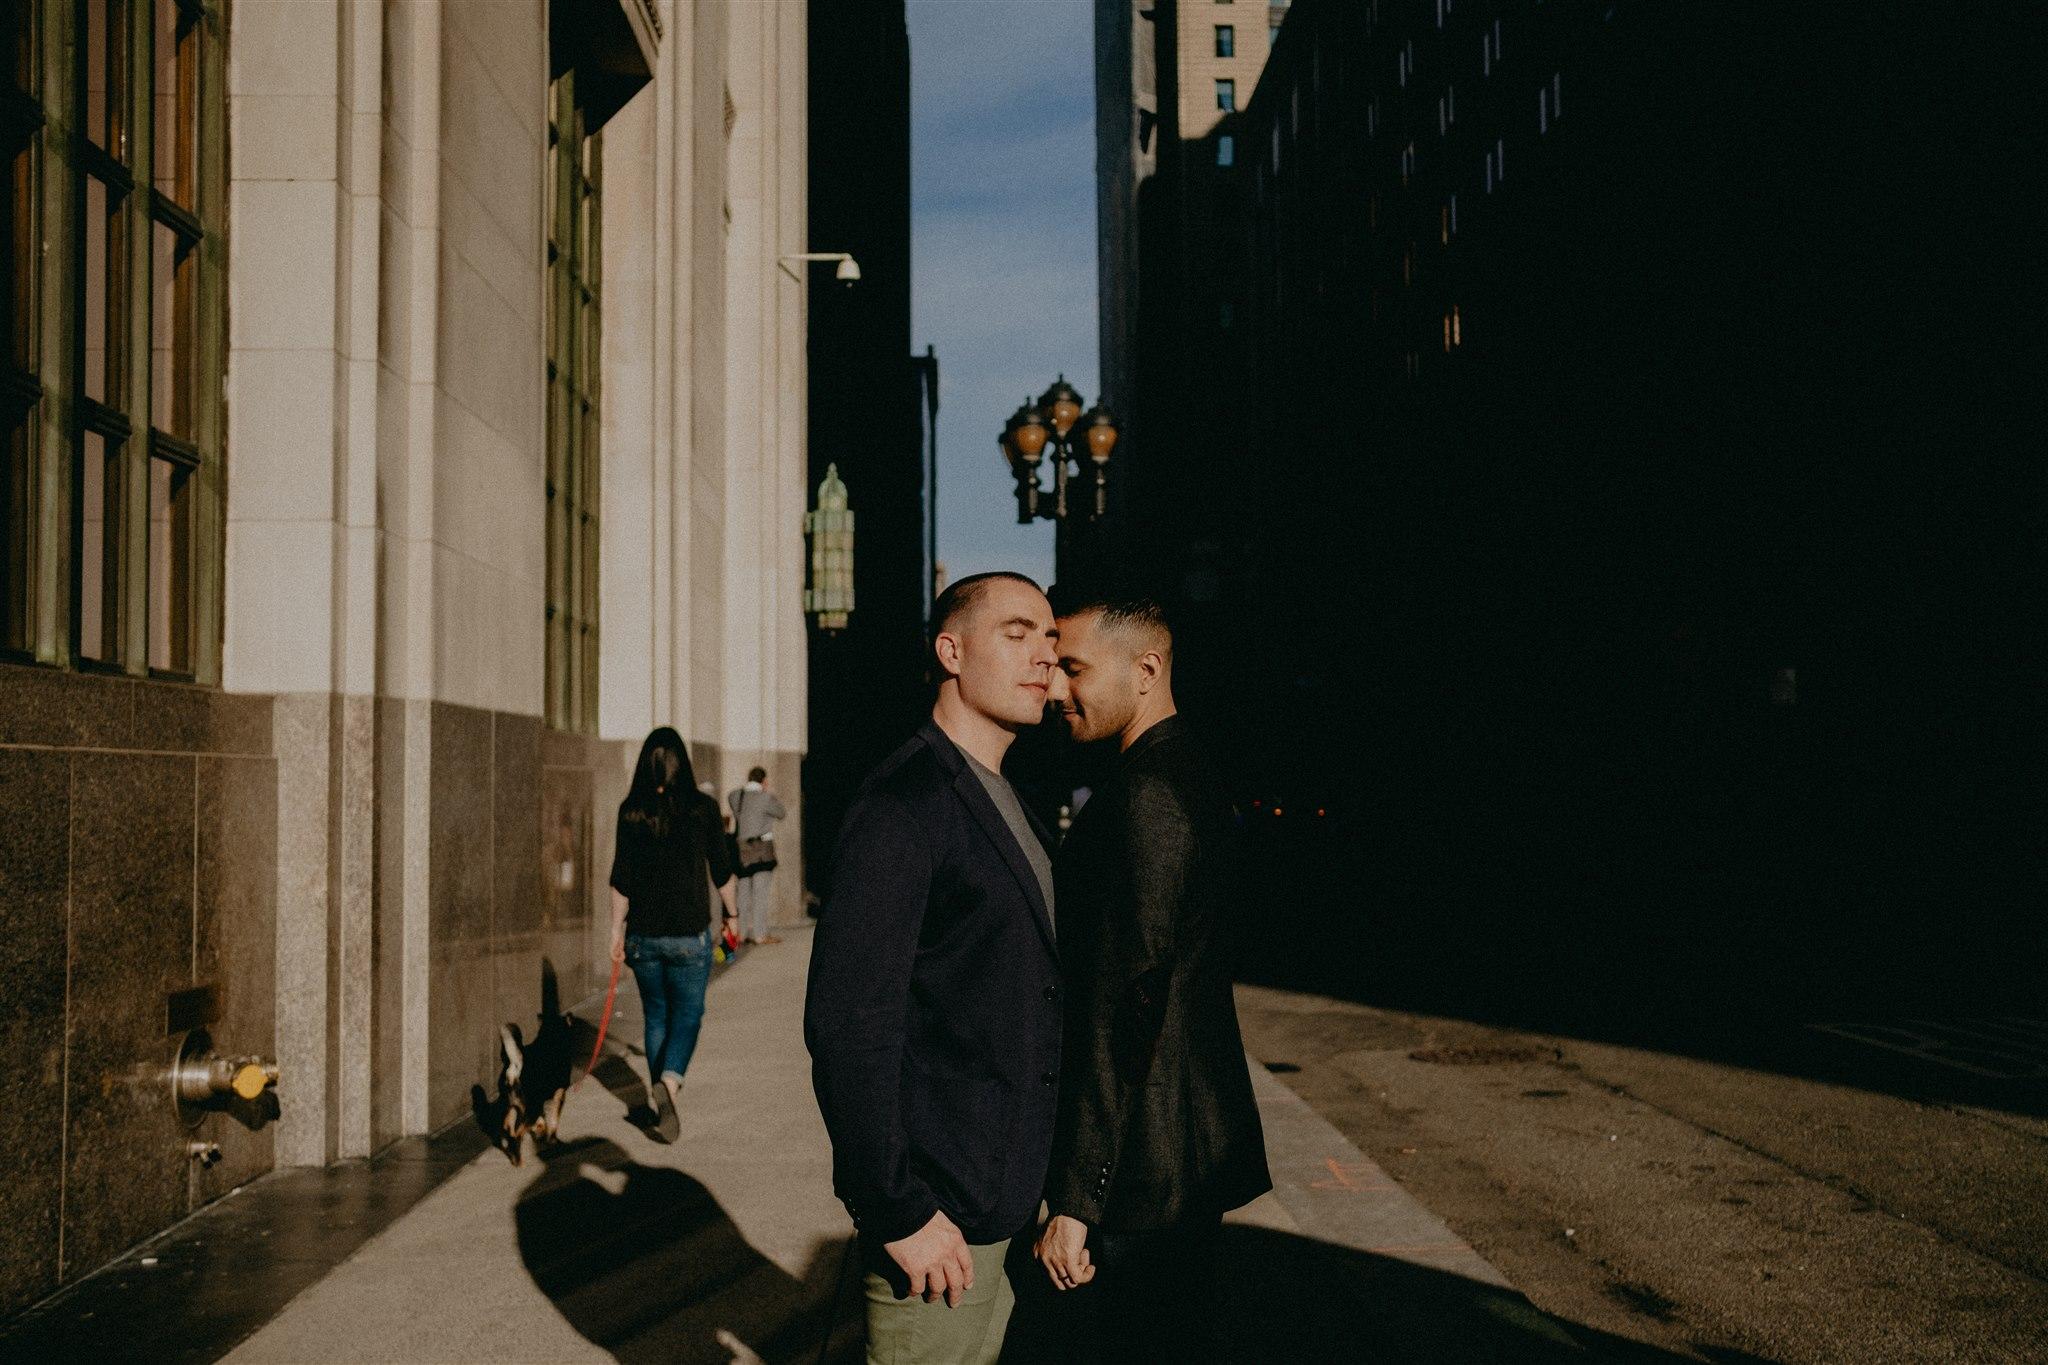 lbgtq-gay-wedding-elopement-photography-chellise-michael-photography280.JPG